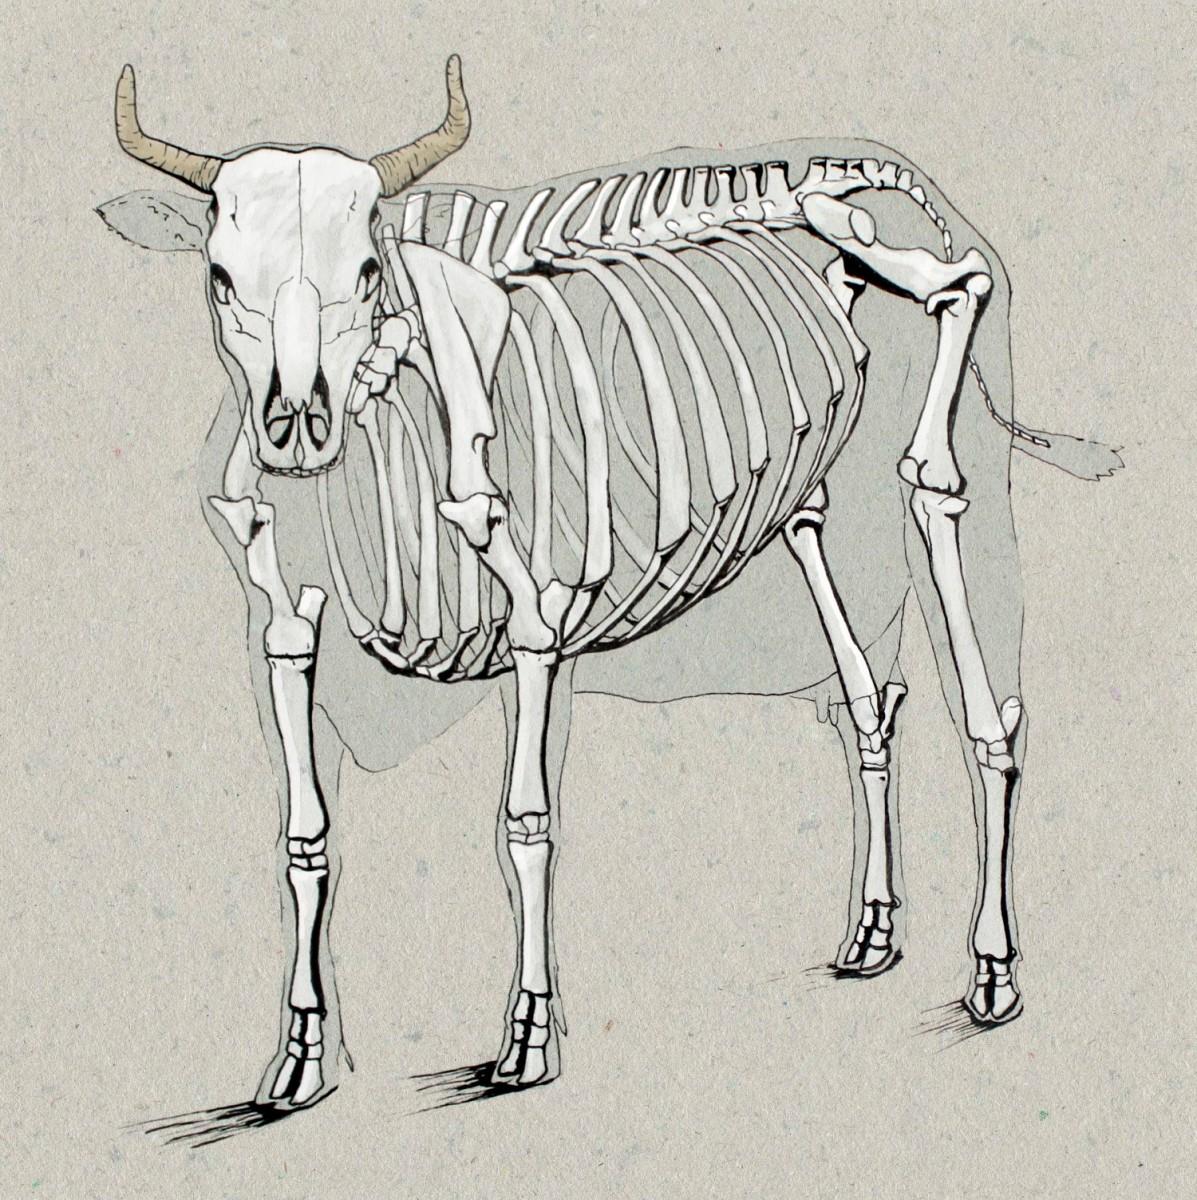 cow skeleton bones diagram kenmore dryer thermostat wiring anatomy drawing greg tatum